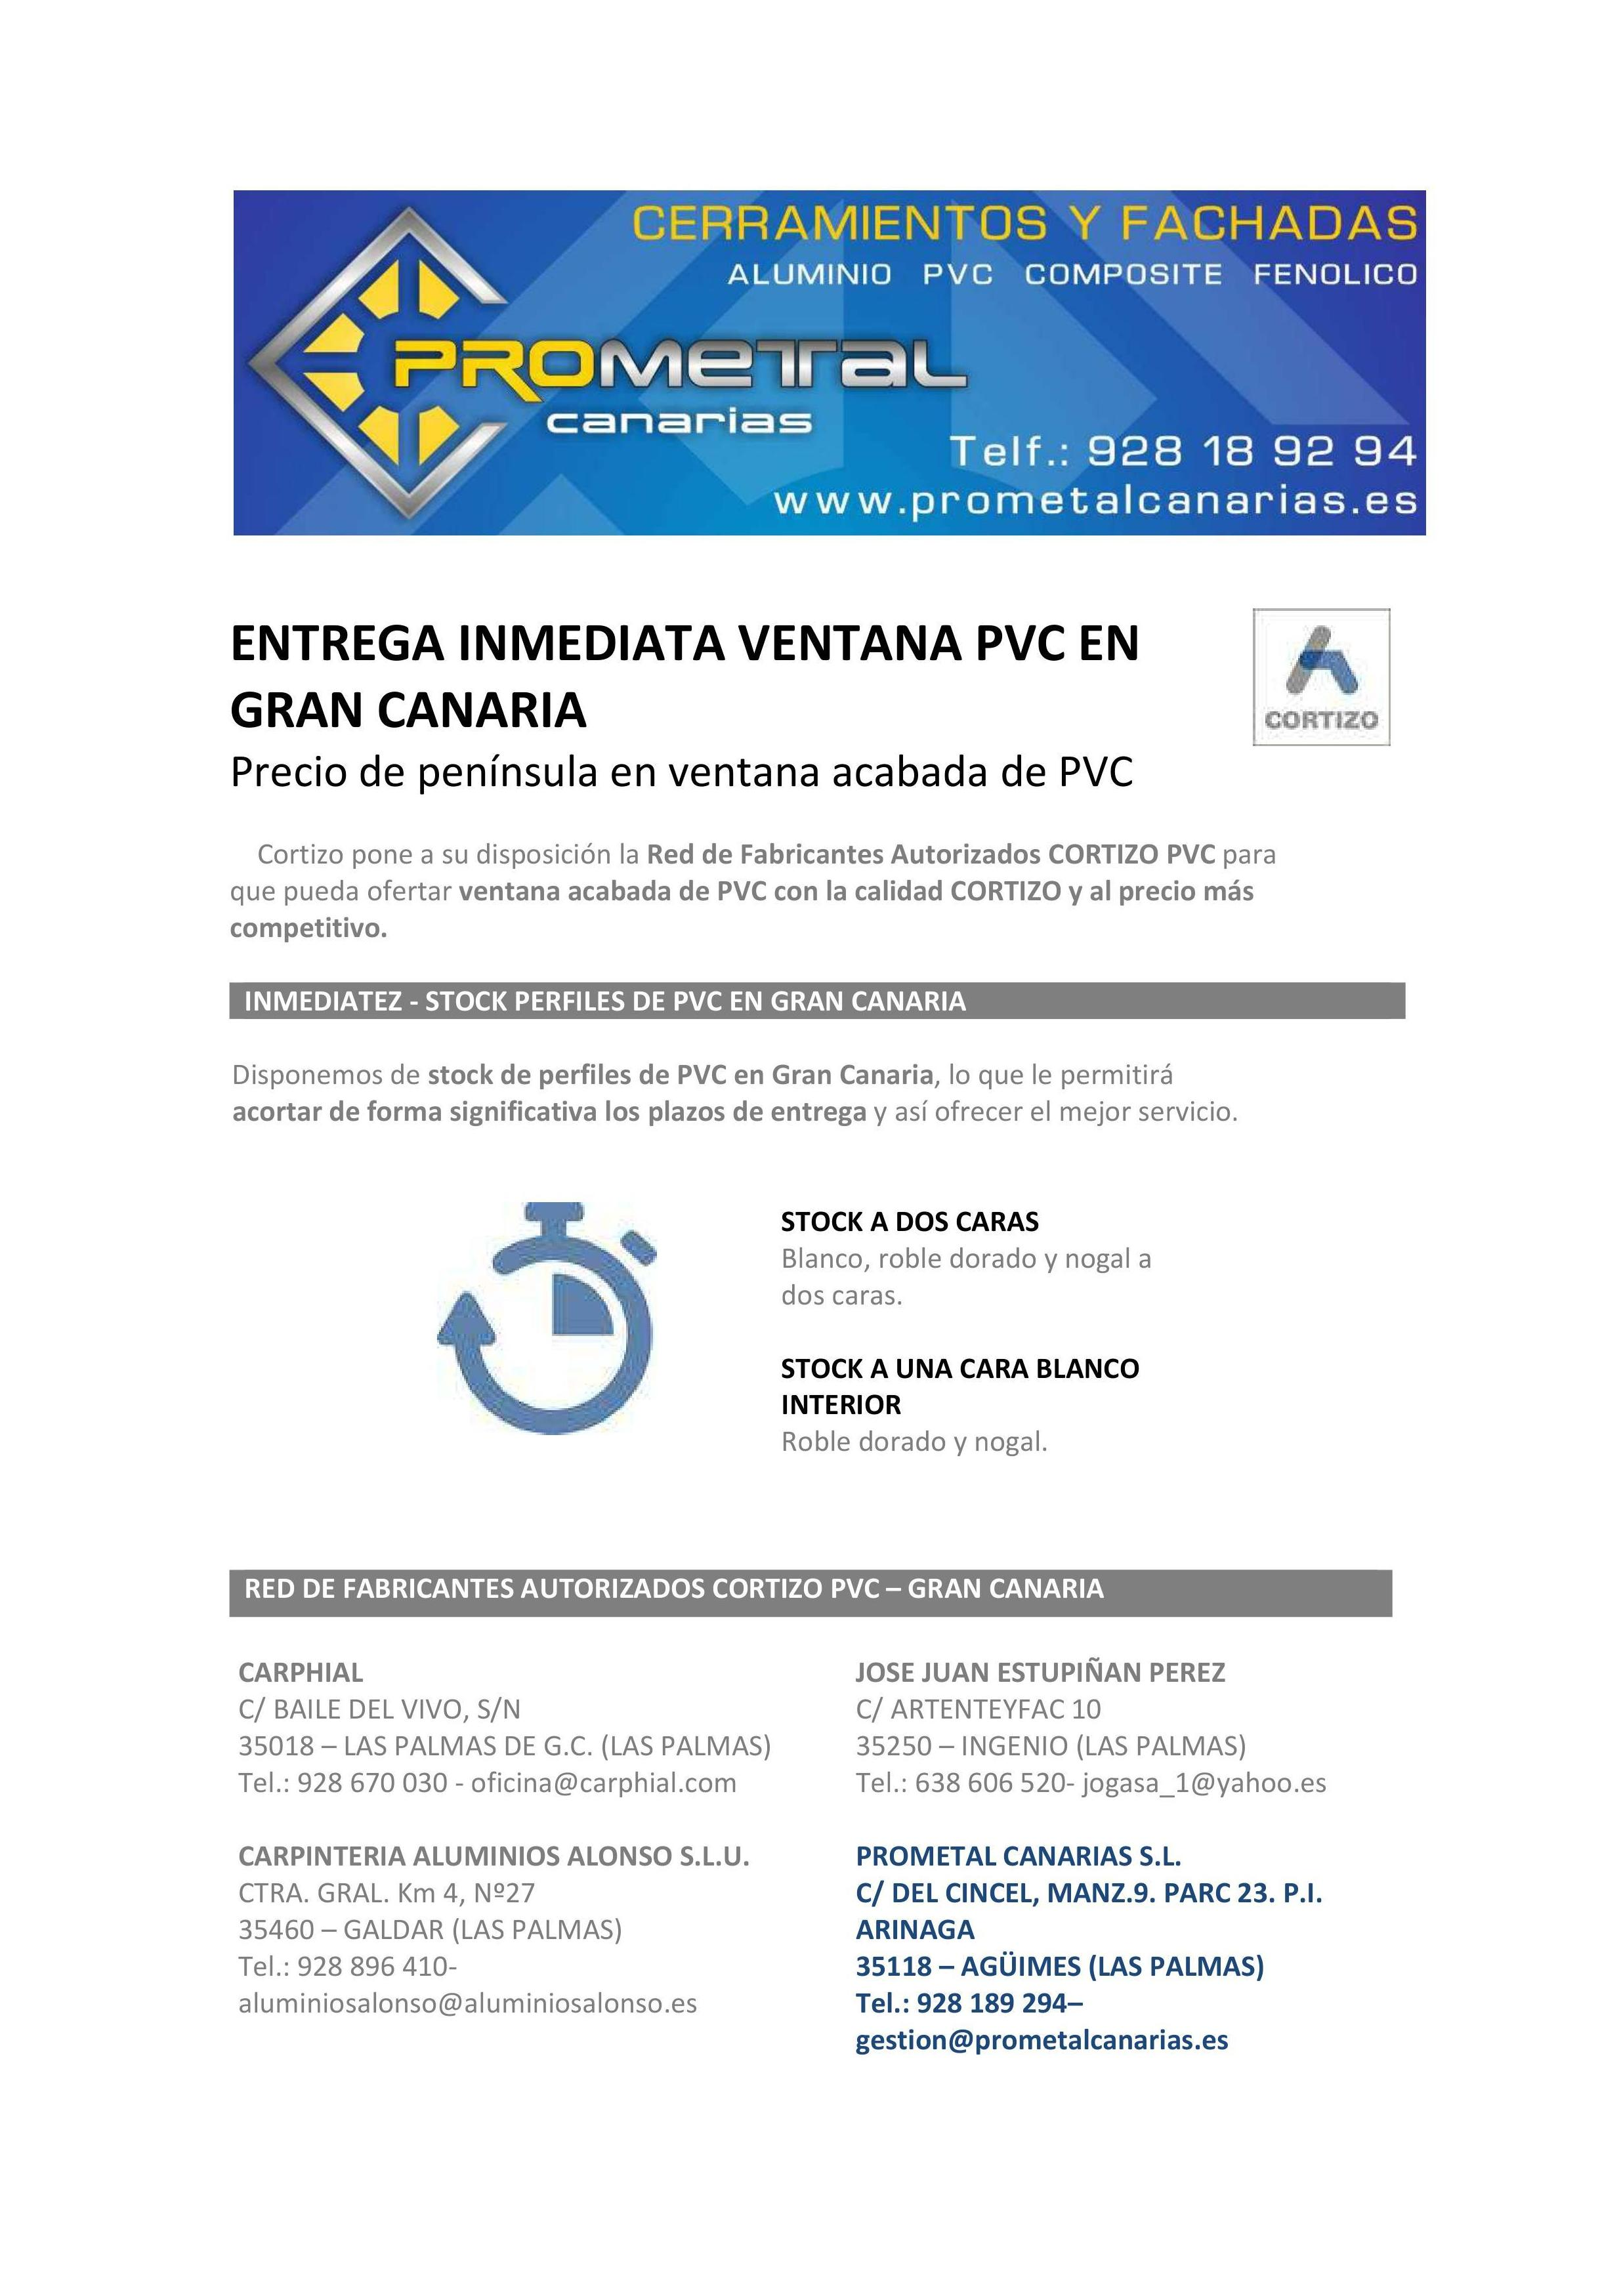 PVC PROMETAL